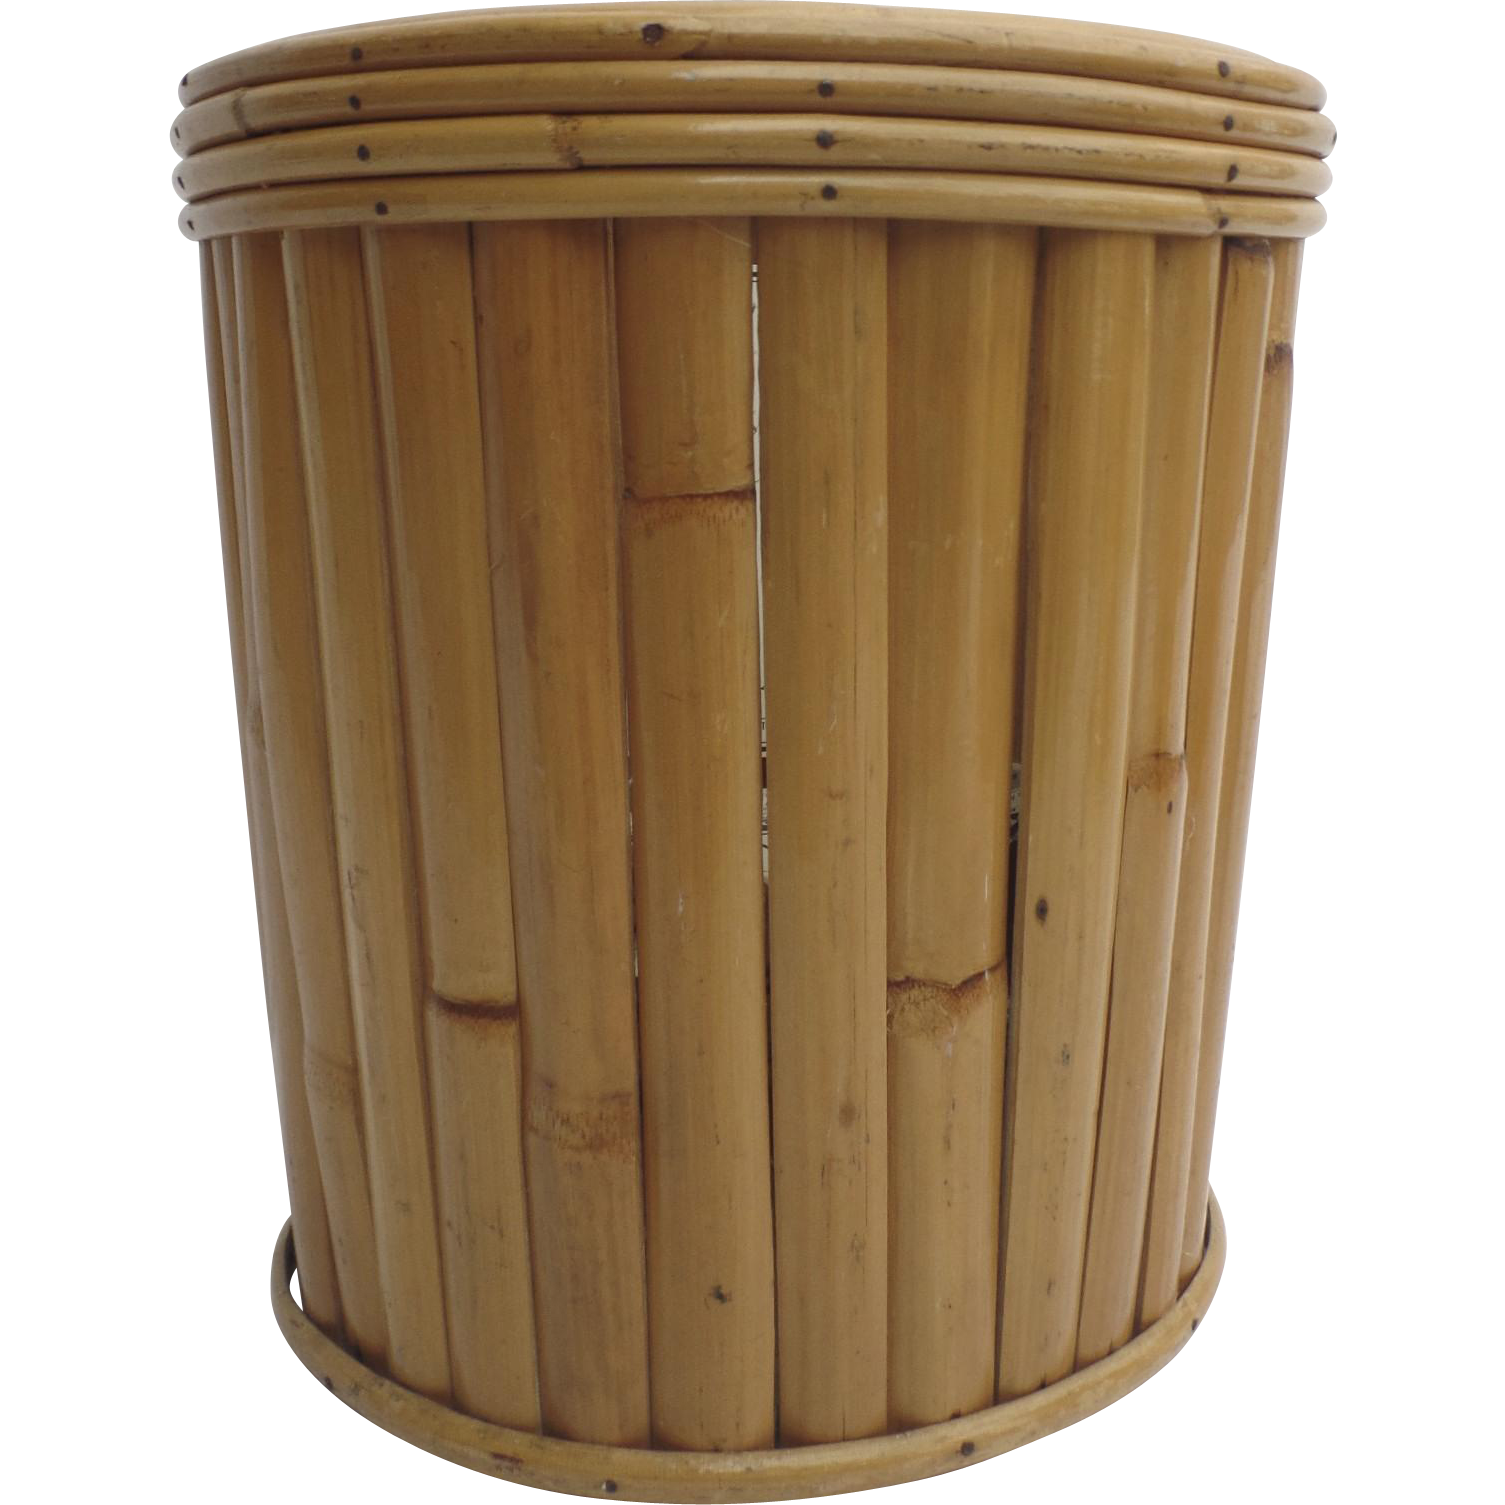 Vintage Bamboo Trash Waste Can Basket 1960's from blacktulip on Ruby Lane1505 x 1505 png 1147kB